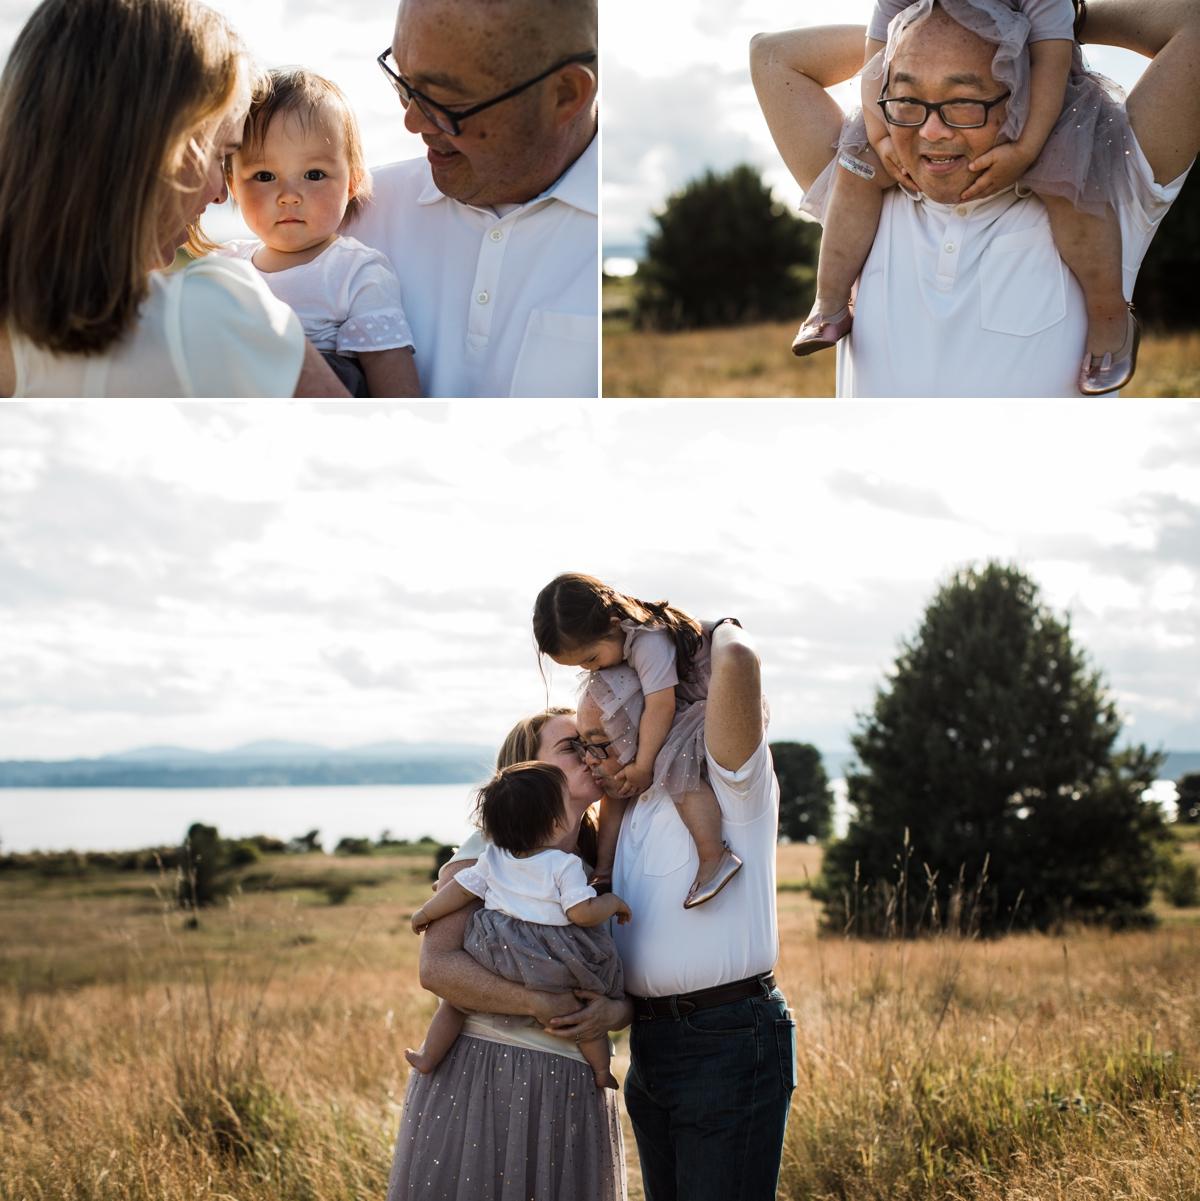 elena s blair photography seattle family photographer outdoors 5.jpg